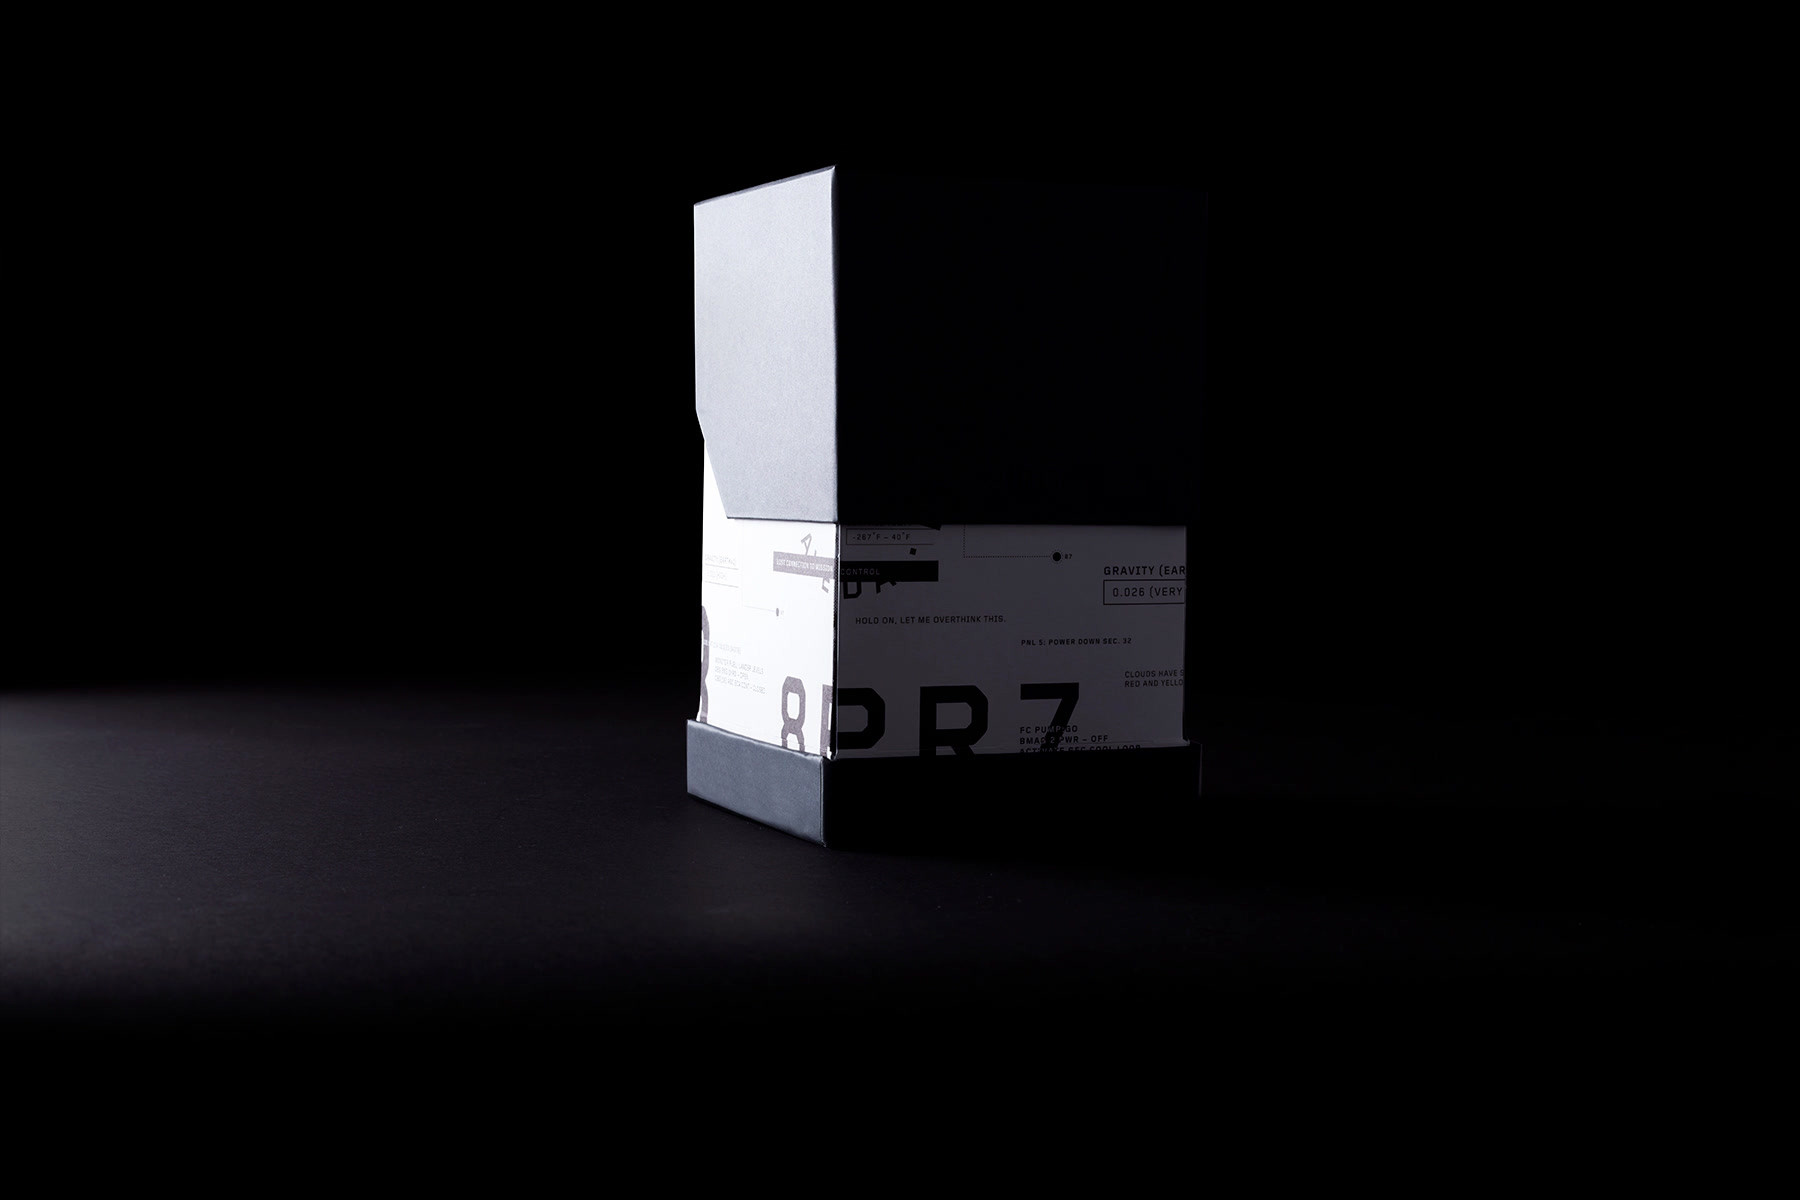 19UC008_Chocolate_Video.mp4